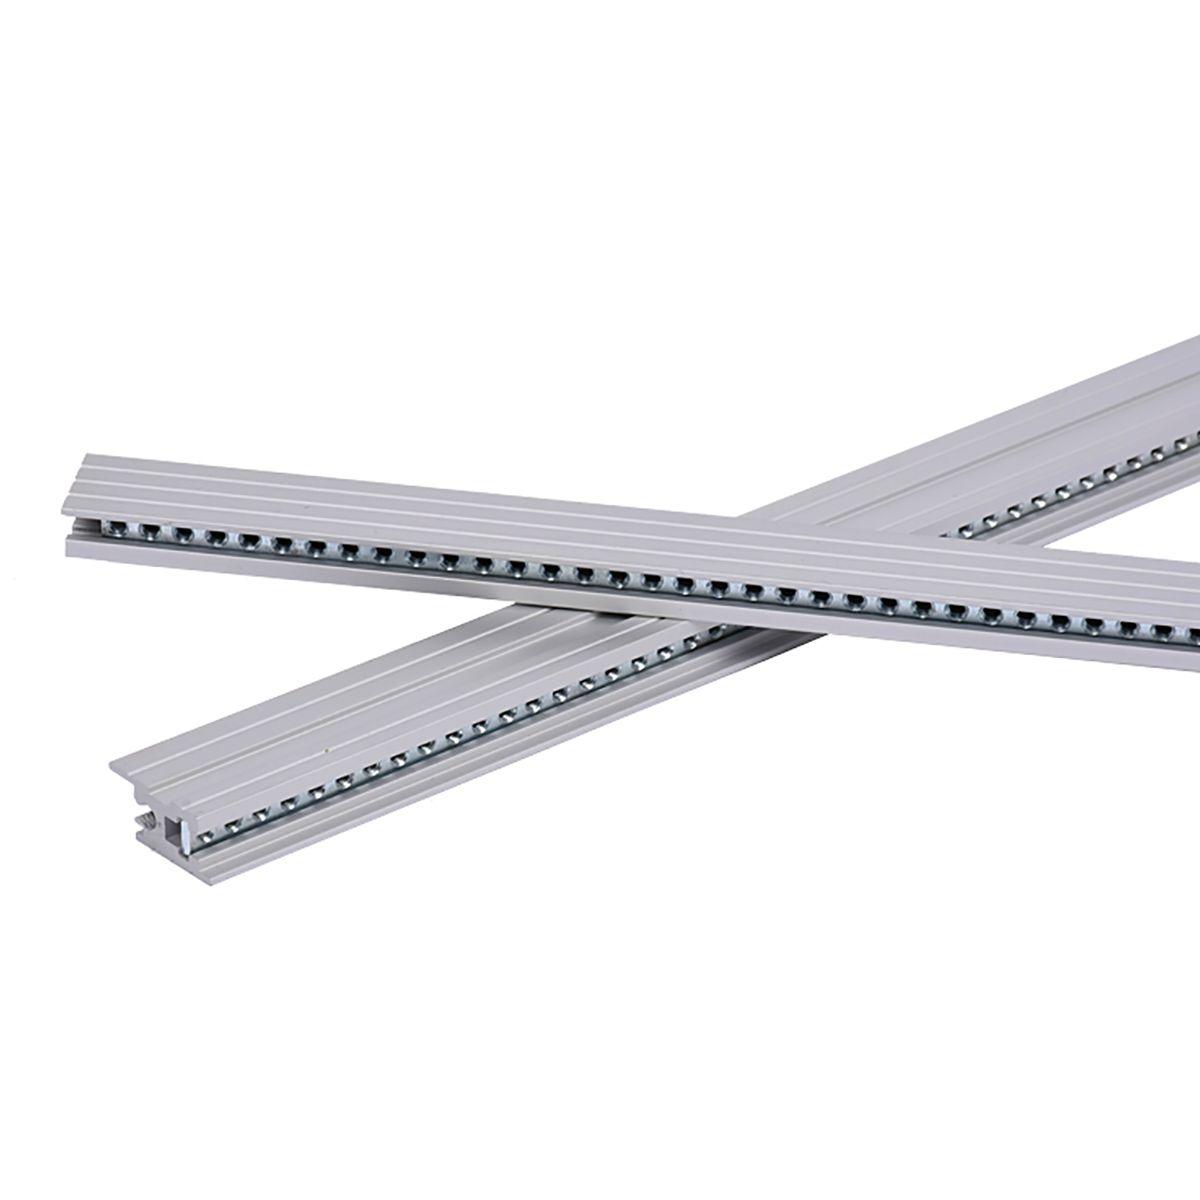 TipTop Audio Z-Rails 84HP Eurorack Mounting Rails - Silver (Pair)